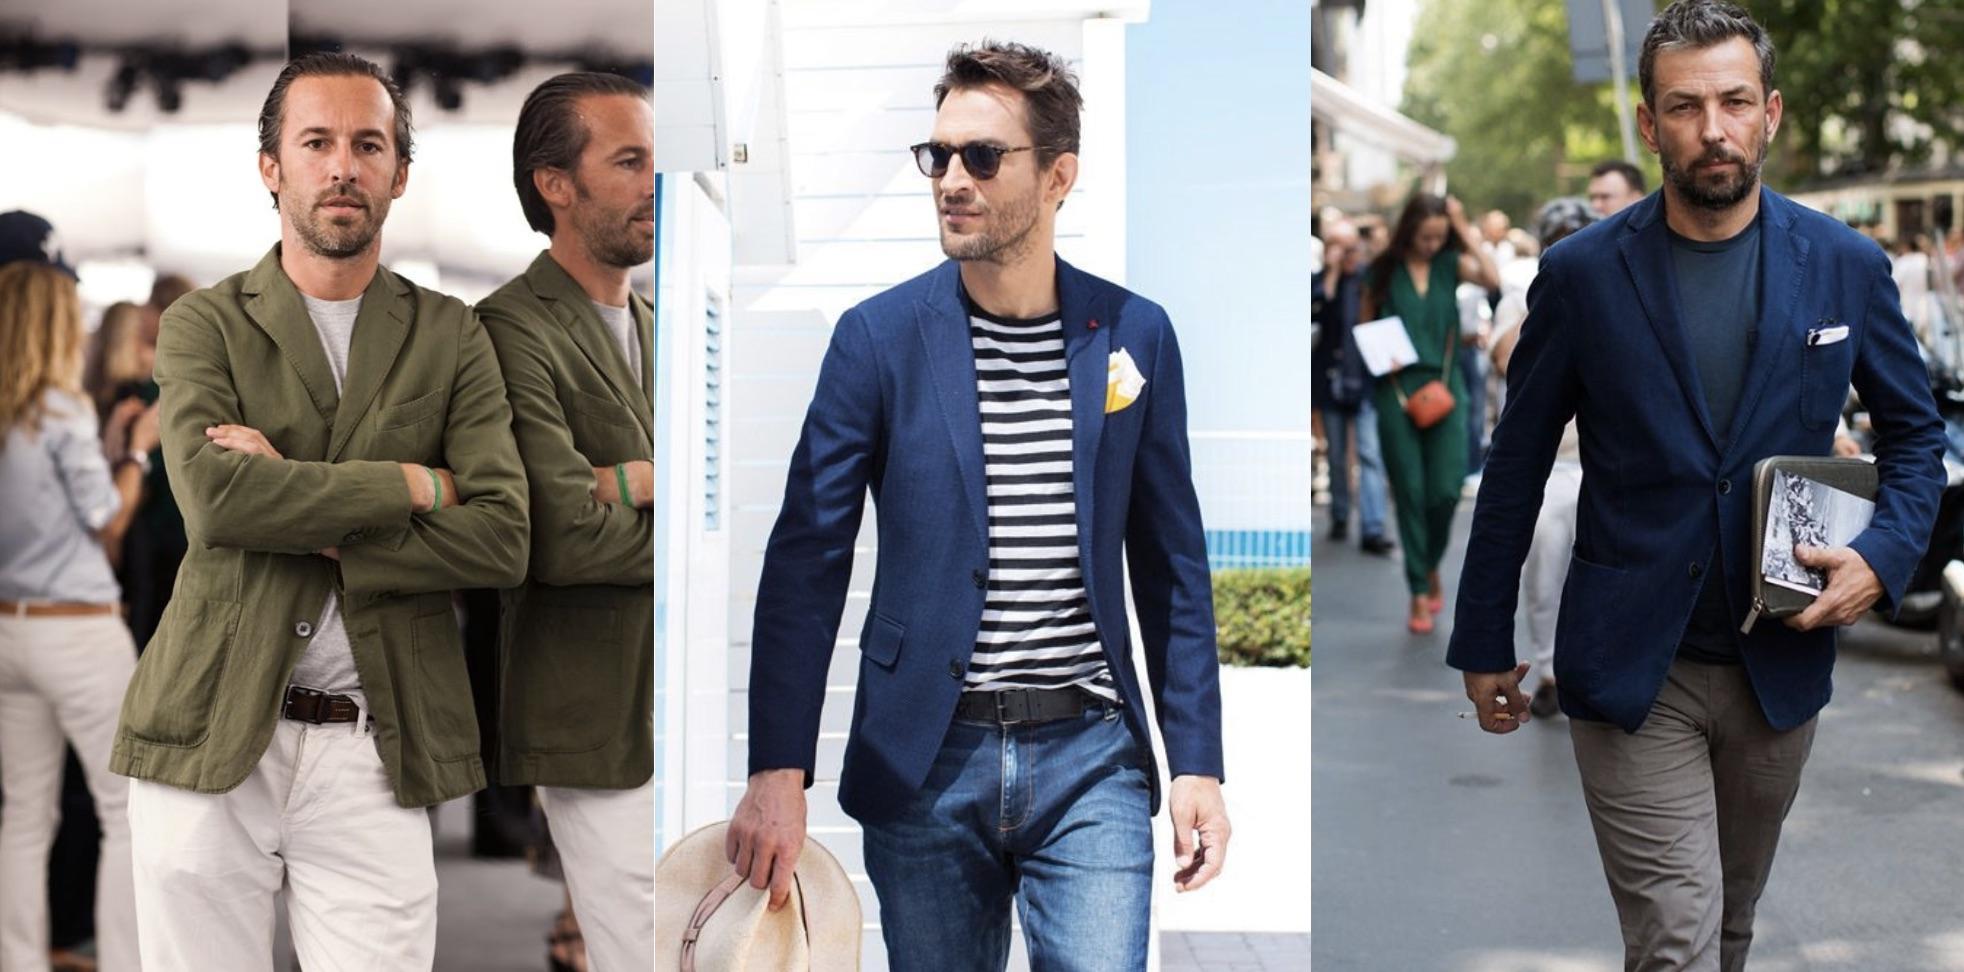 business casual kledingstijl 1